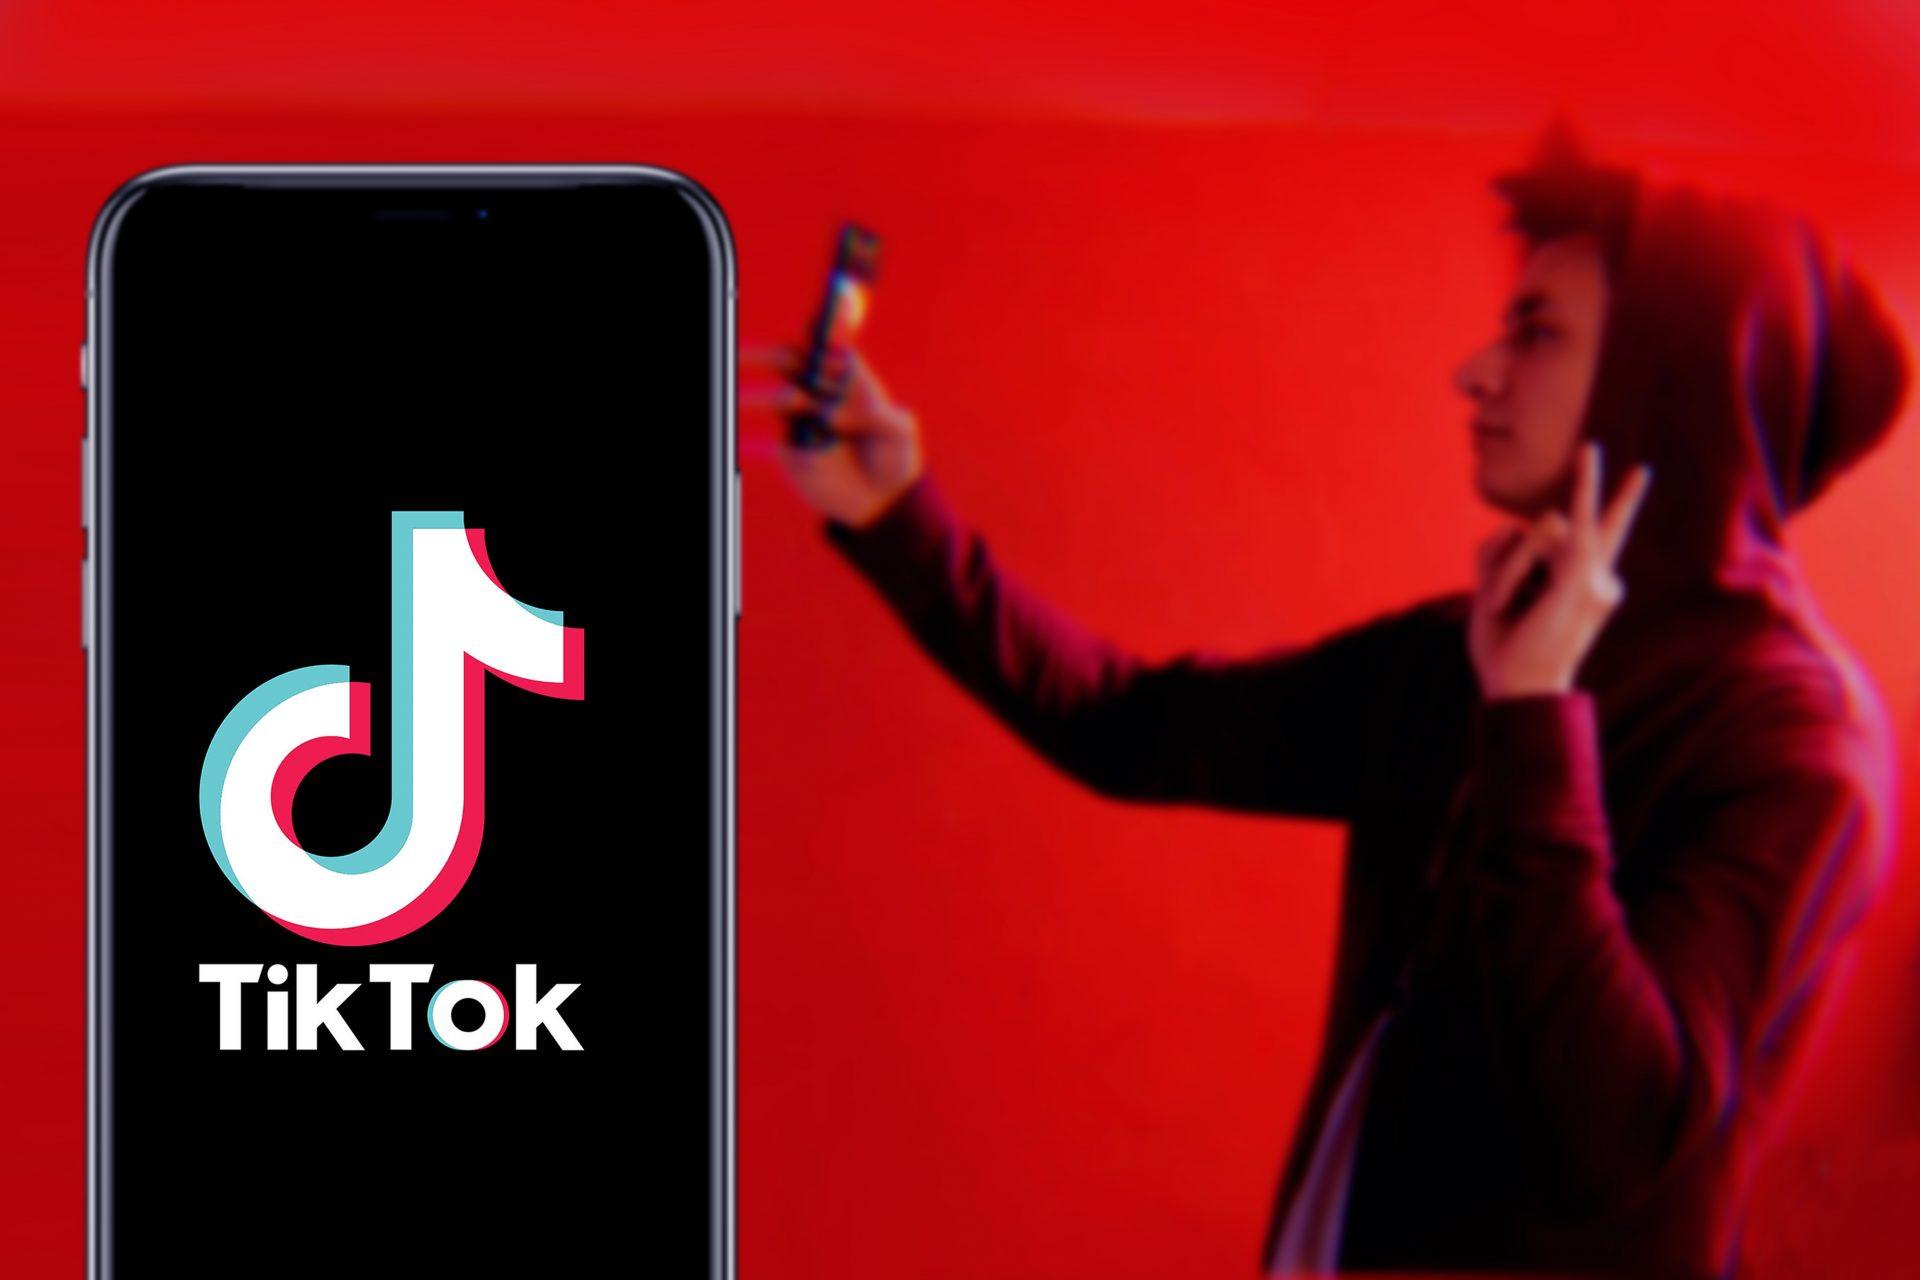 TikTok logo and boy taking selfie on red backround